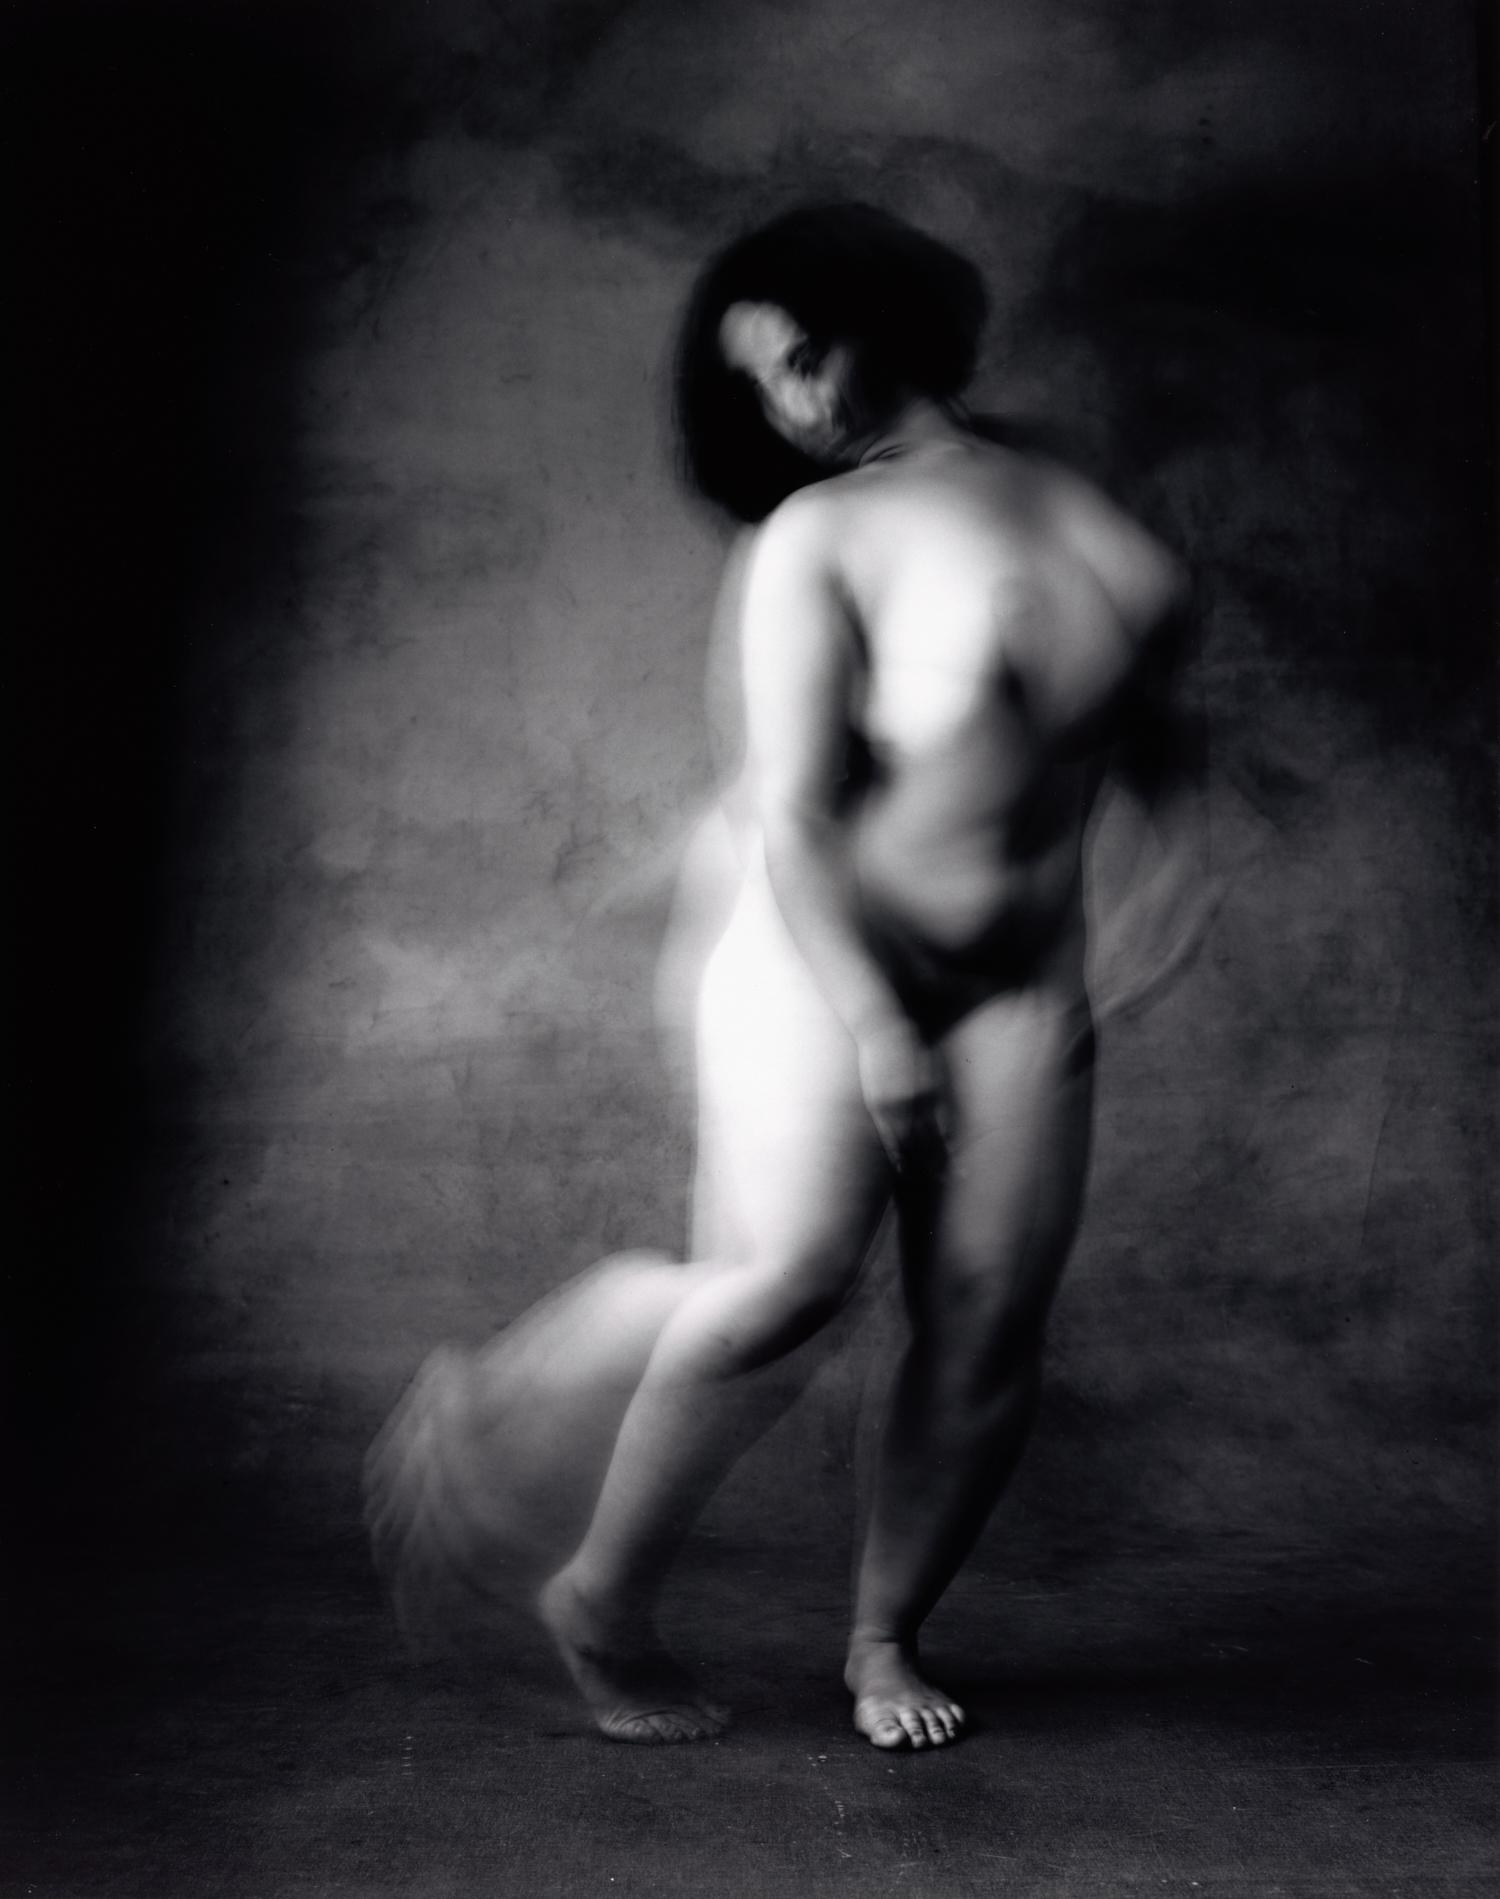 Alexandra Beller (OO) , New York, 1999 Gelatin silver print © The Irving Penn Foundation